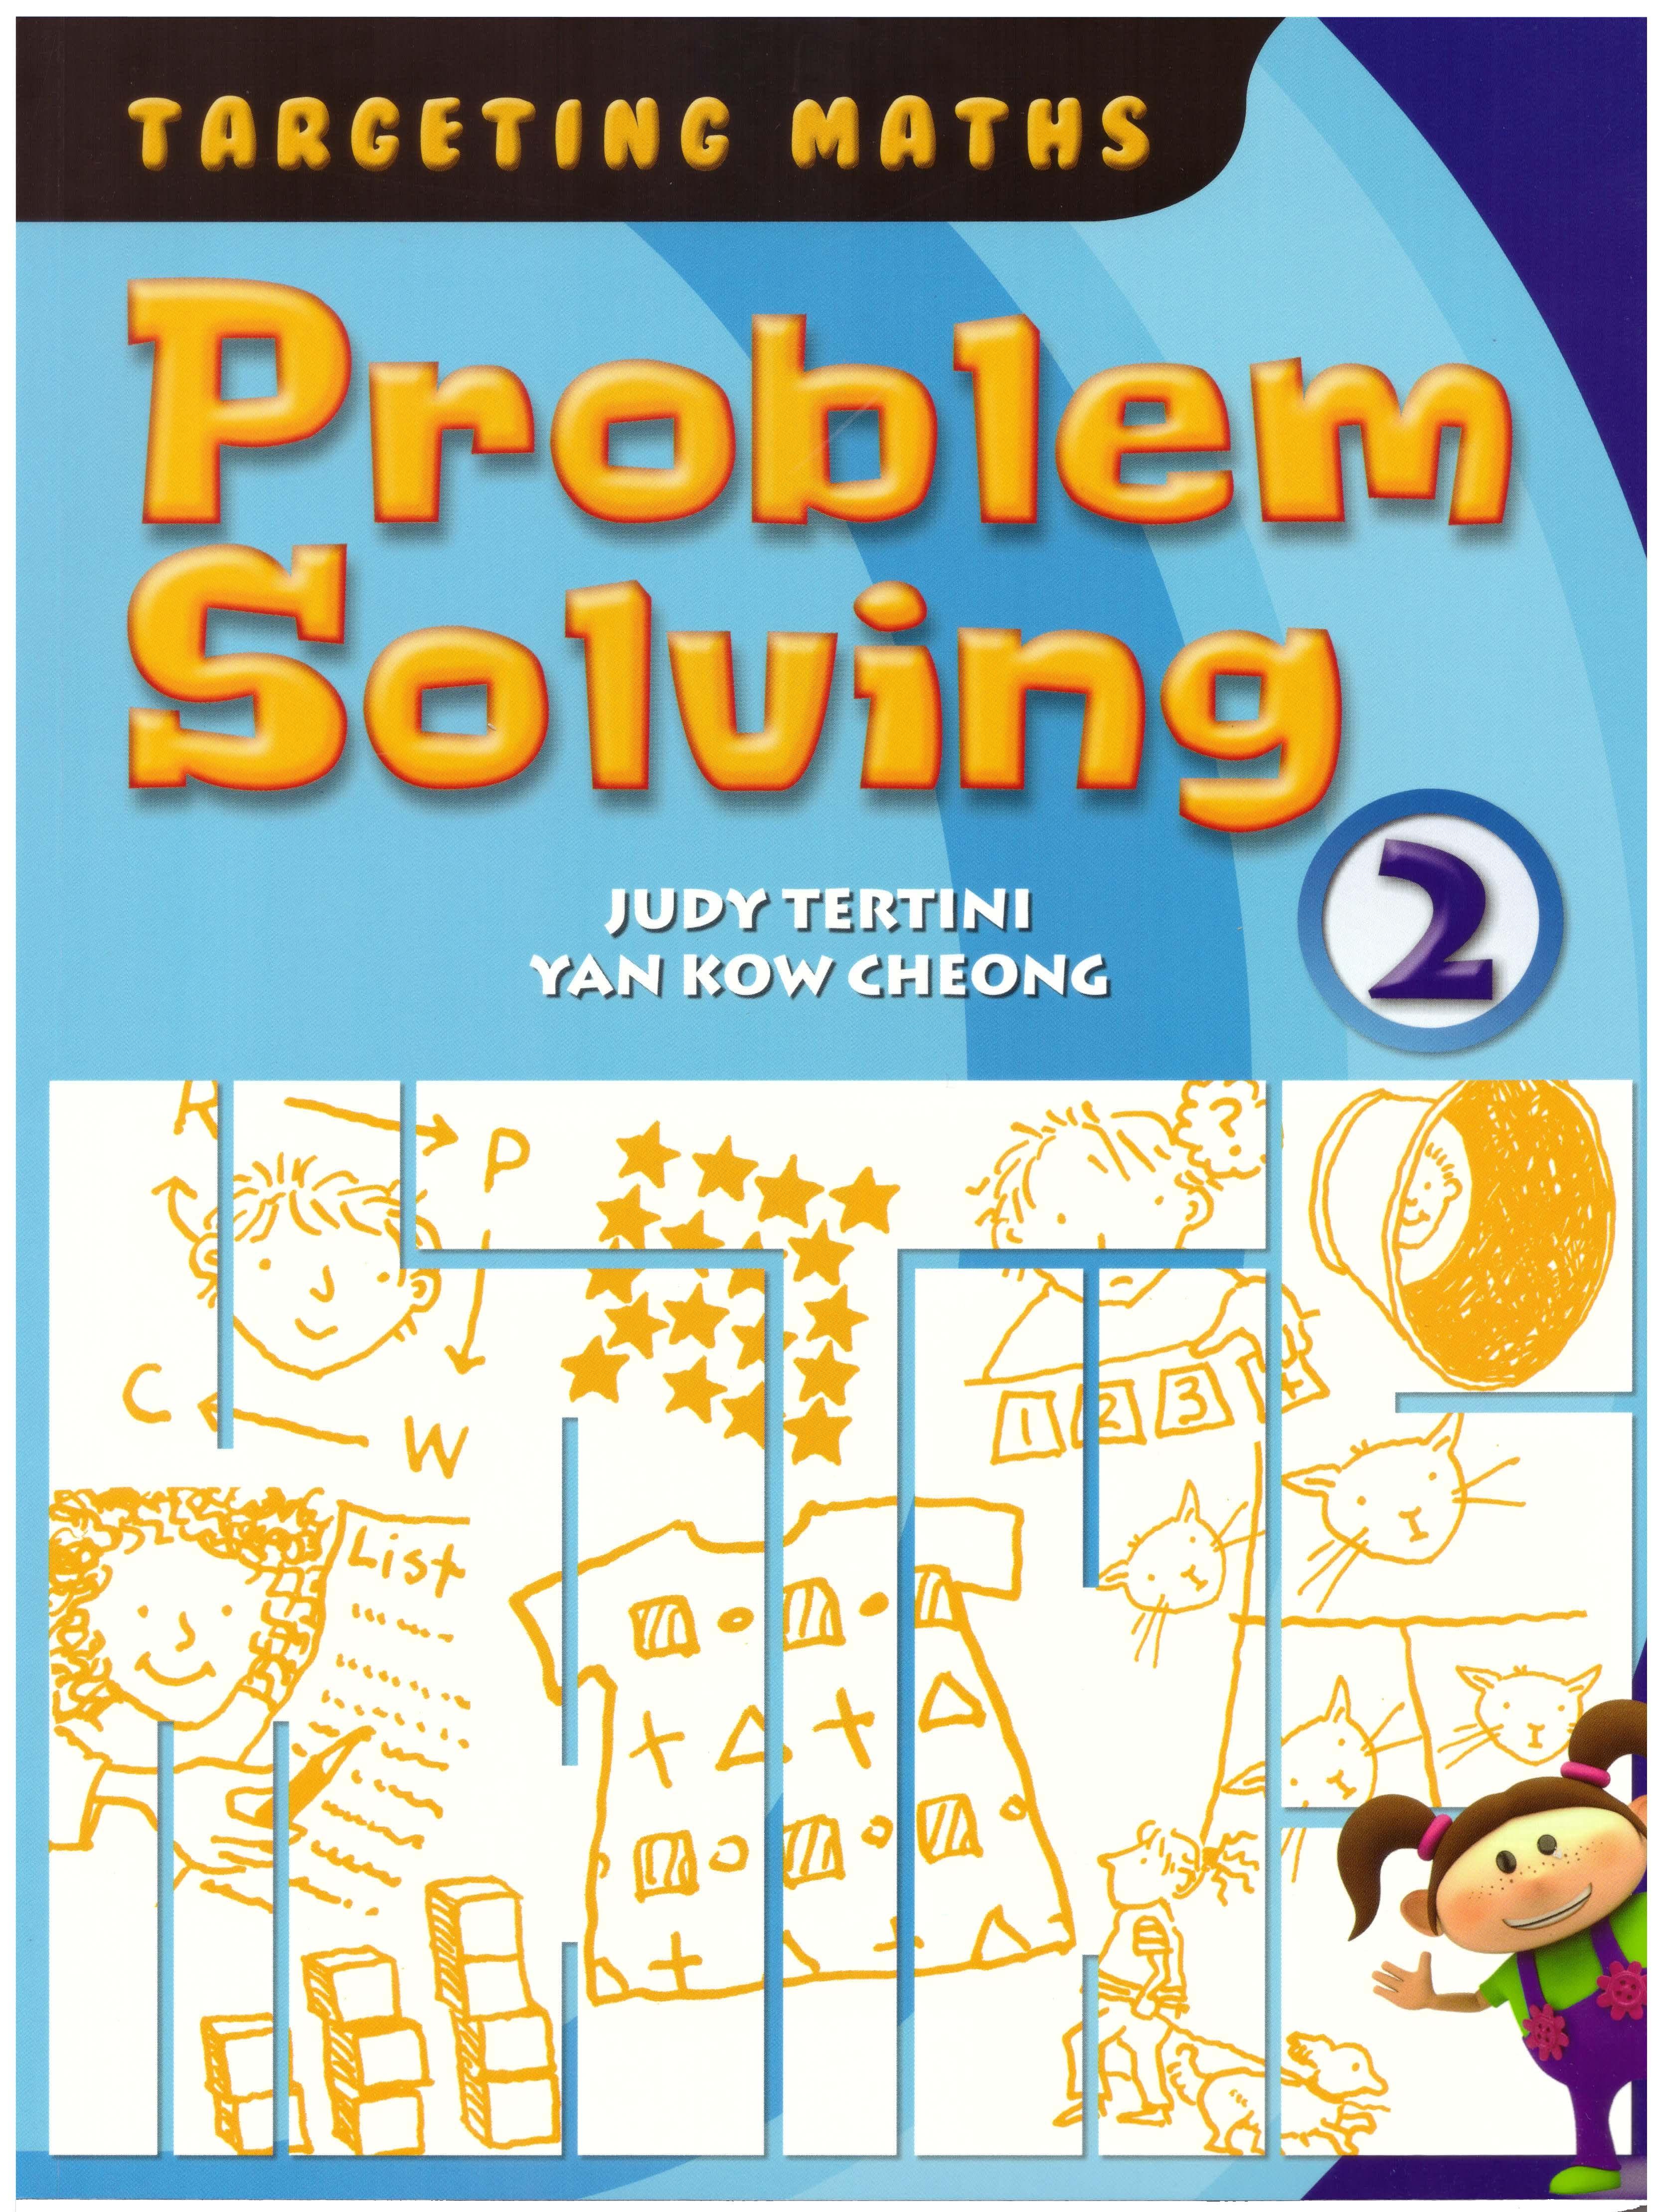 Targeting Maths - Problem Solving 2 | OpenSchoolbag